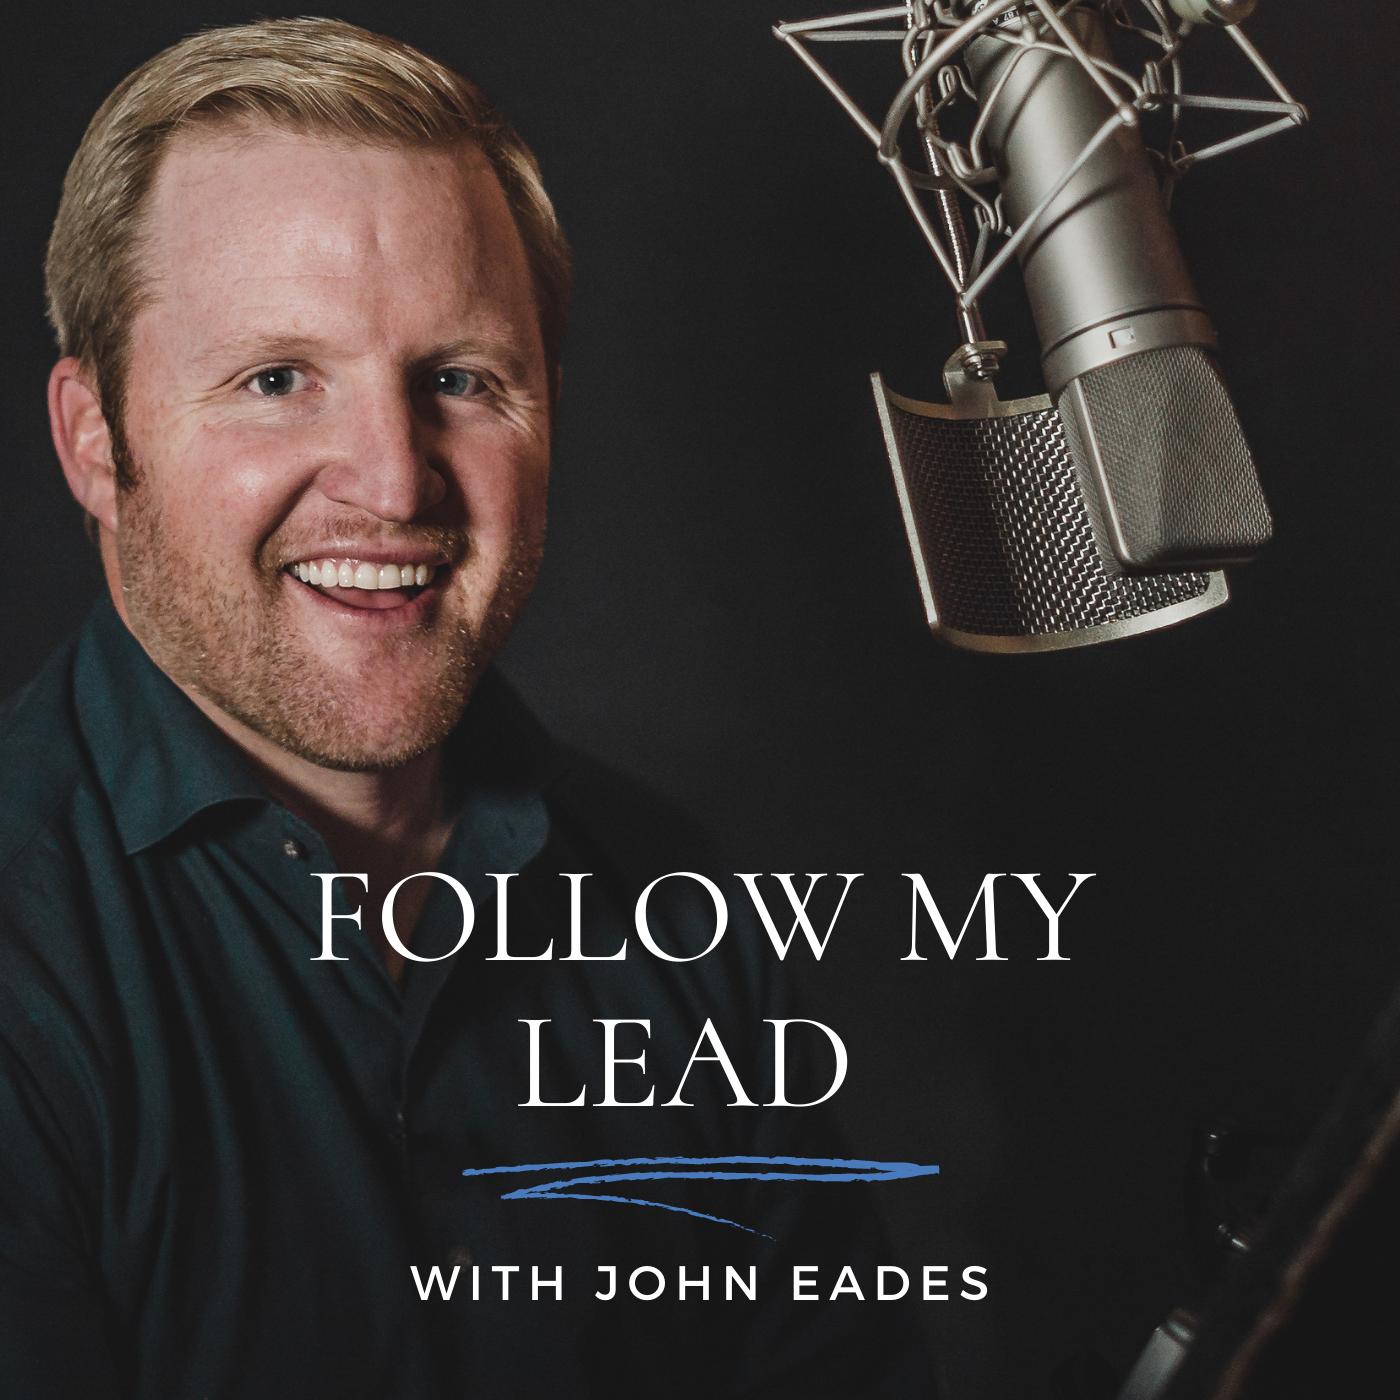 Follow My Lead: Lead Your Best with John Eades show art